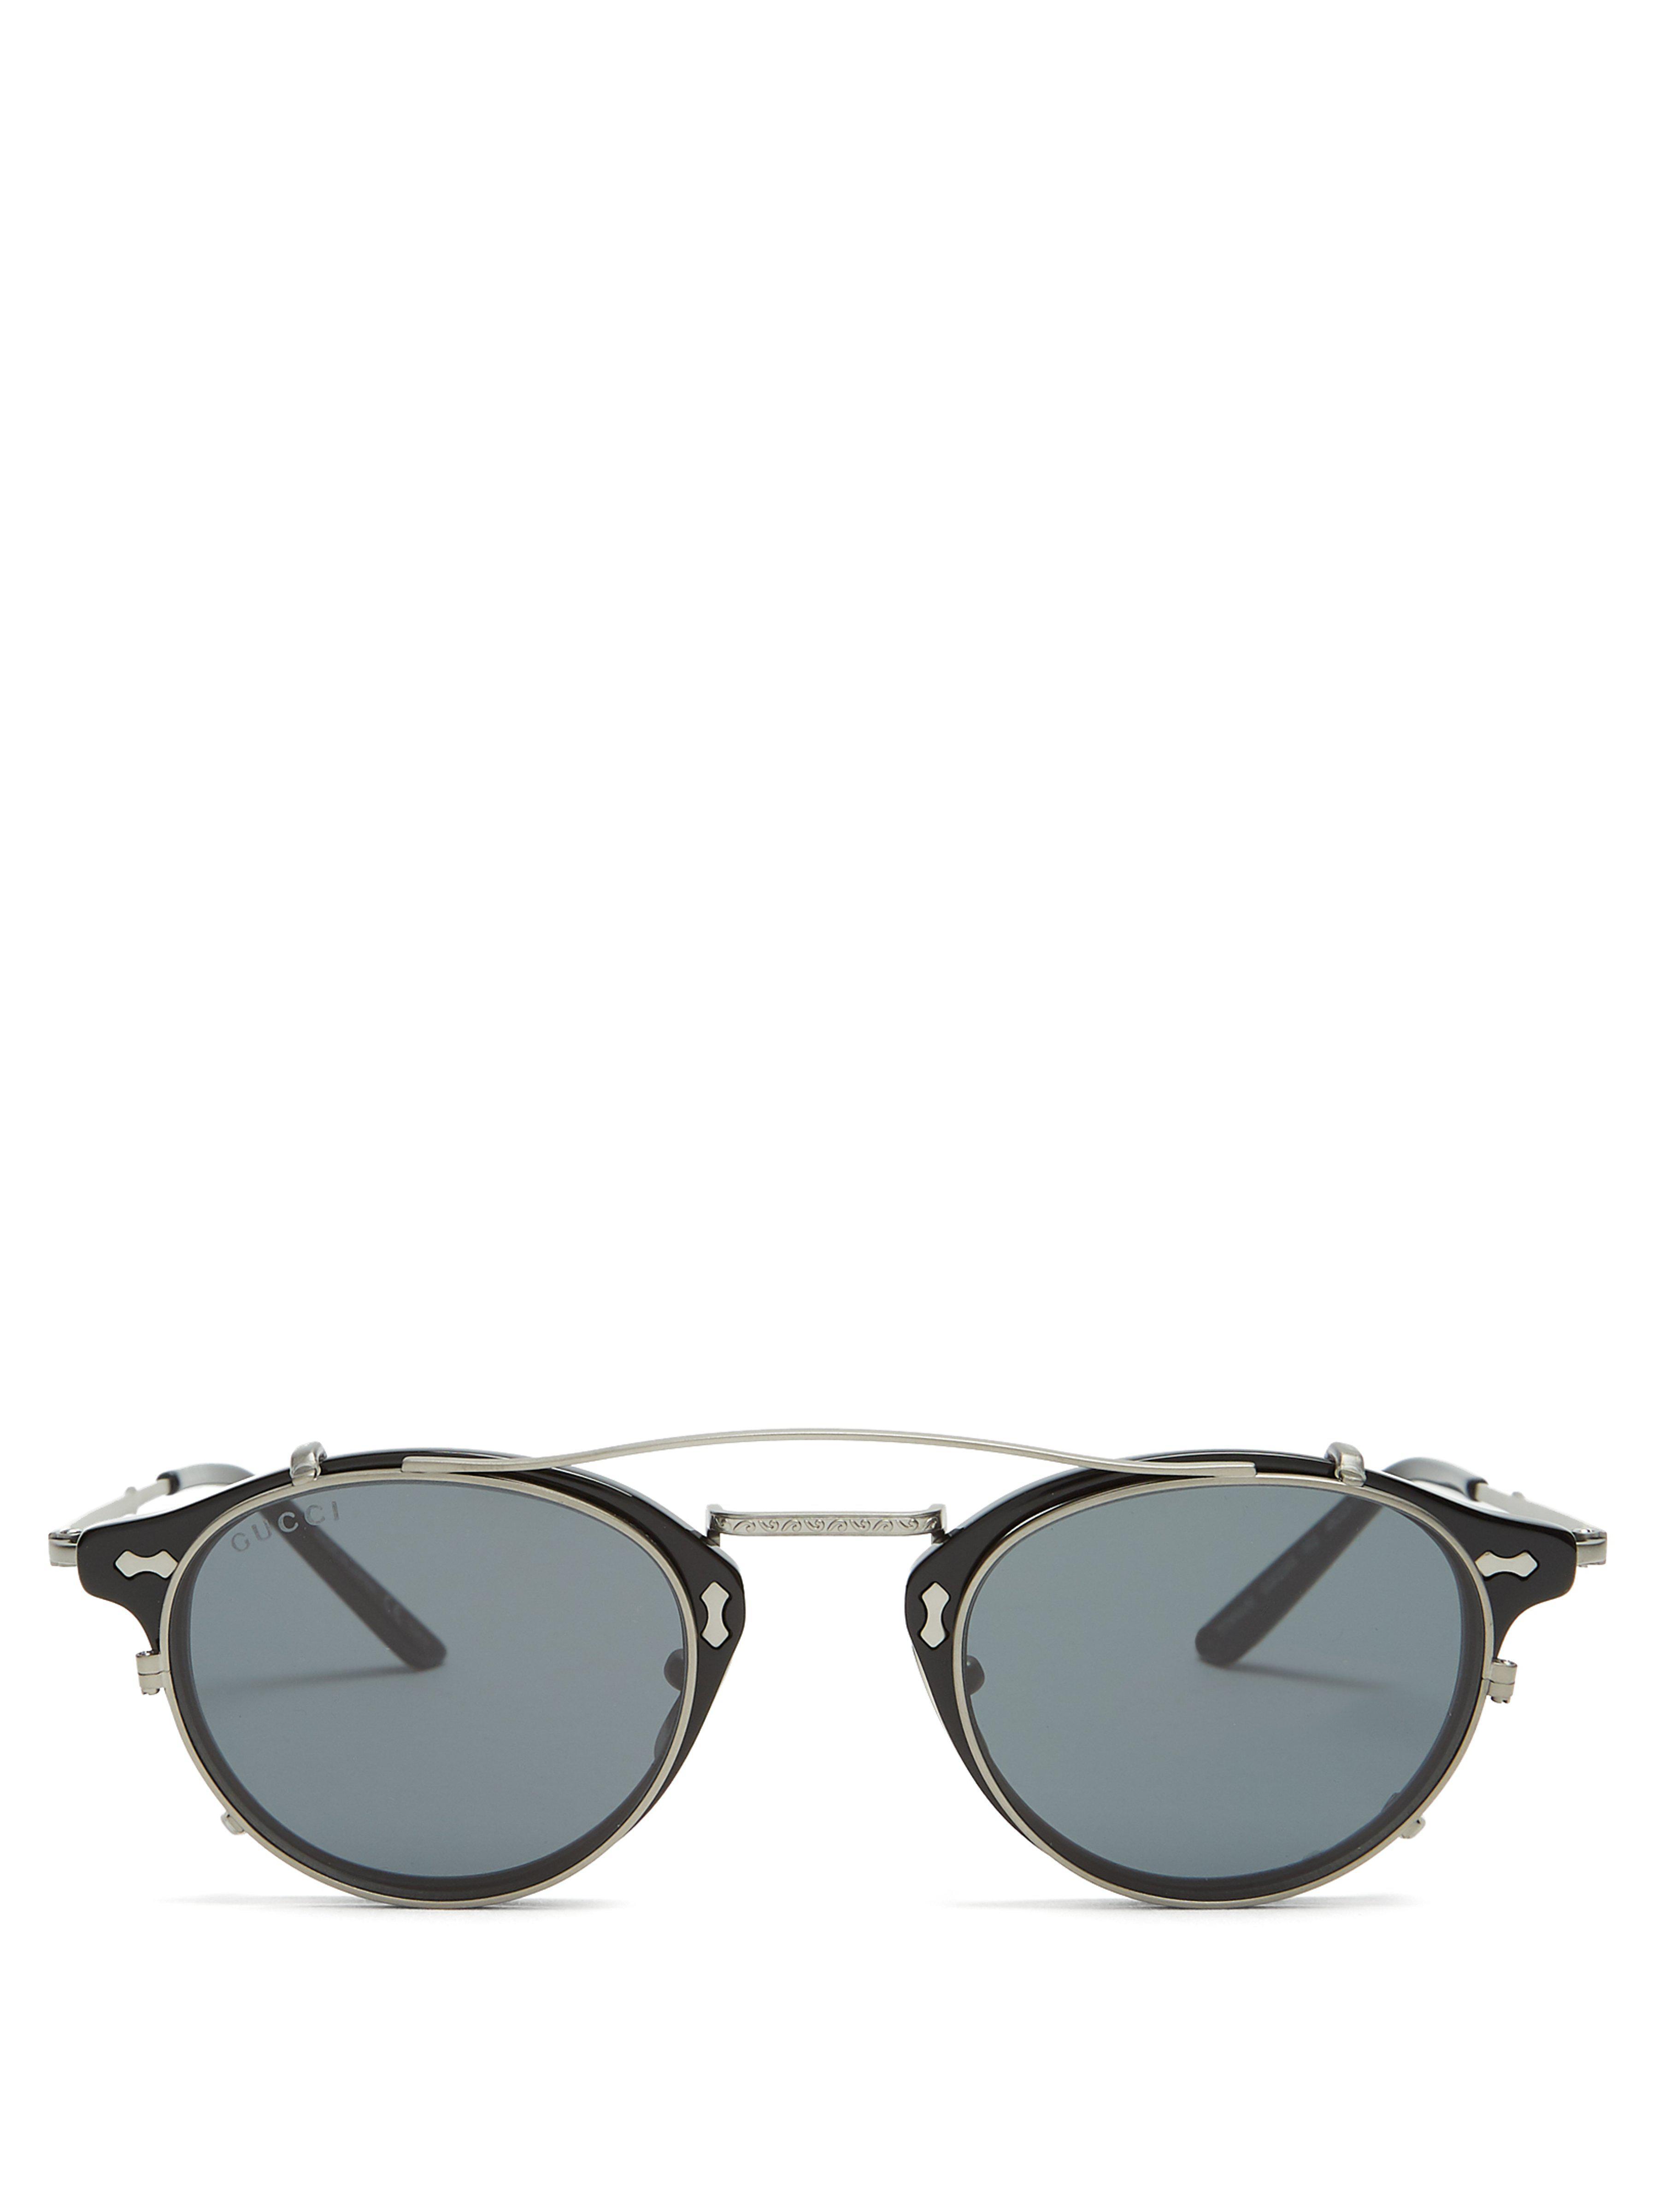 a2ad6ebf3e0 Gucci - Black Detachable Lens Round Frame Acetate Sunglasses for Men - Lyst.  View fullscreen